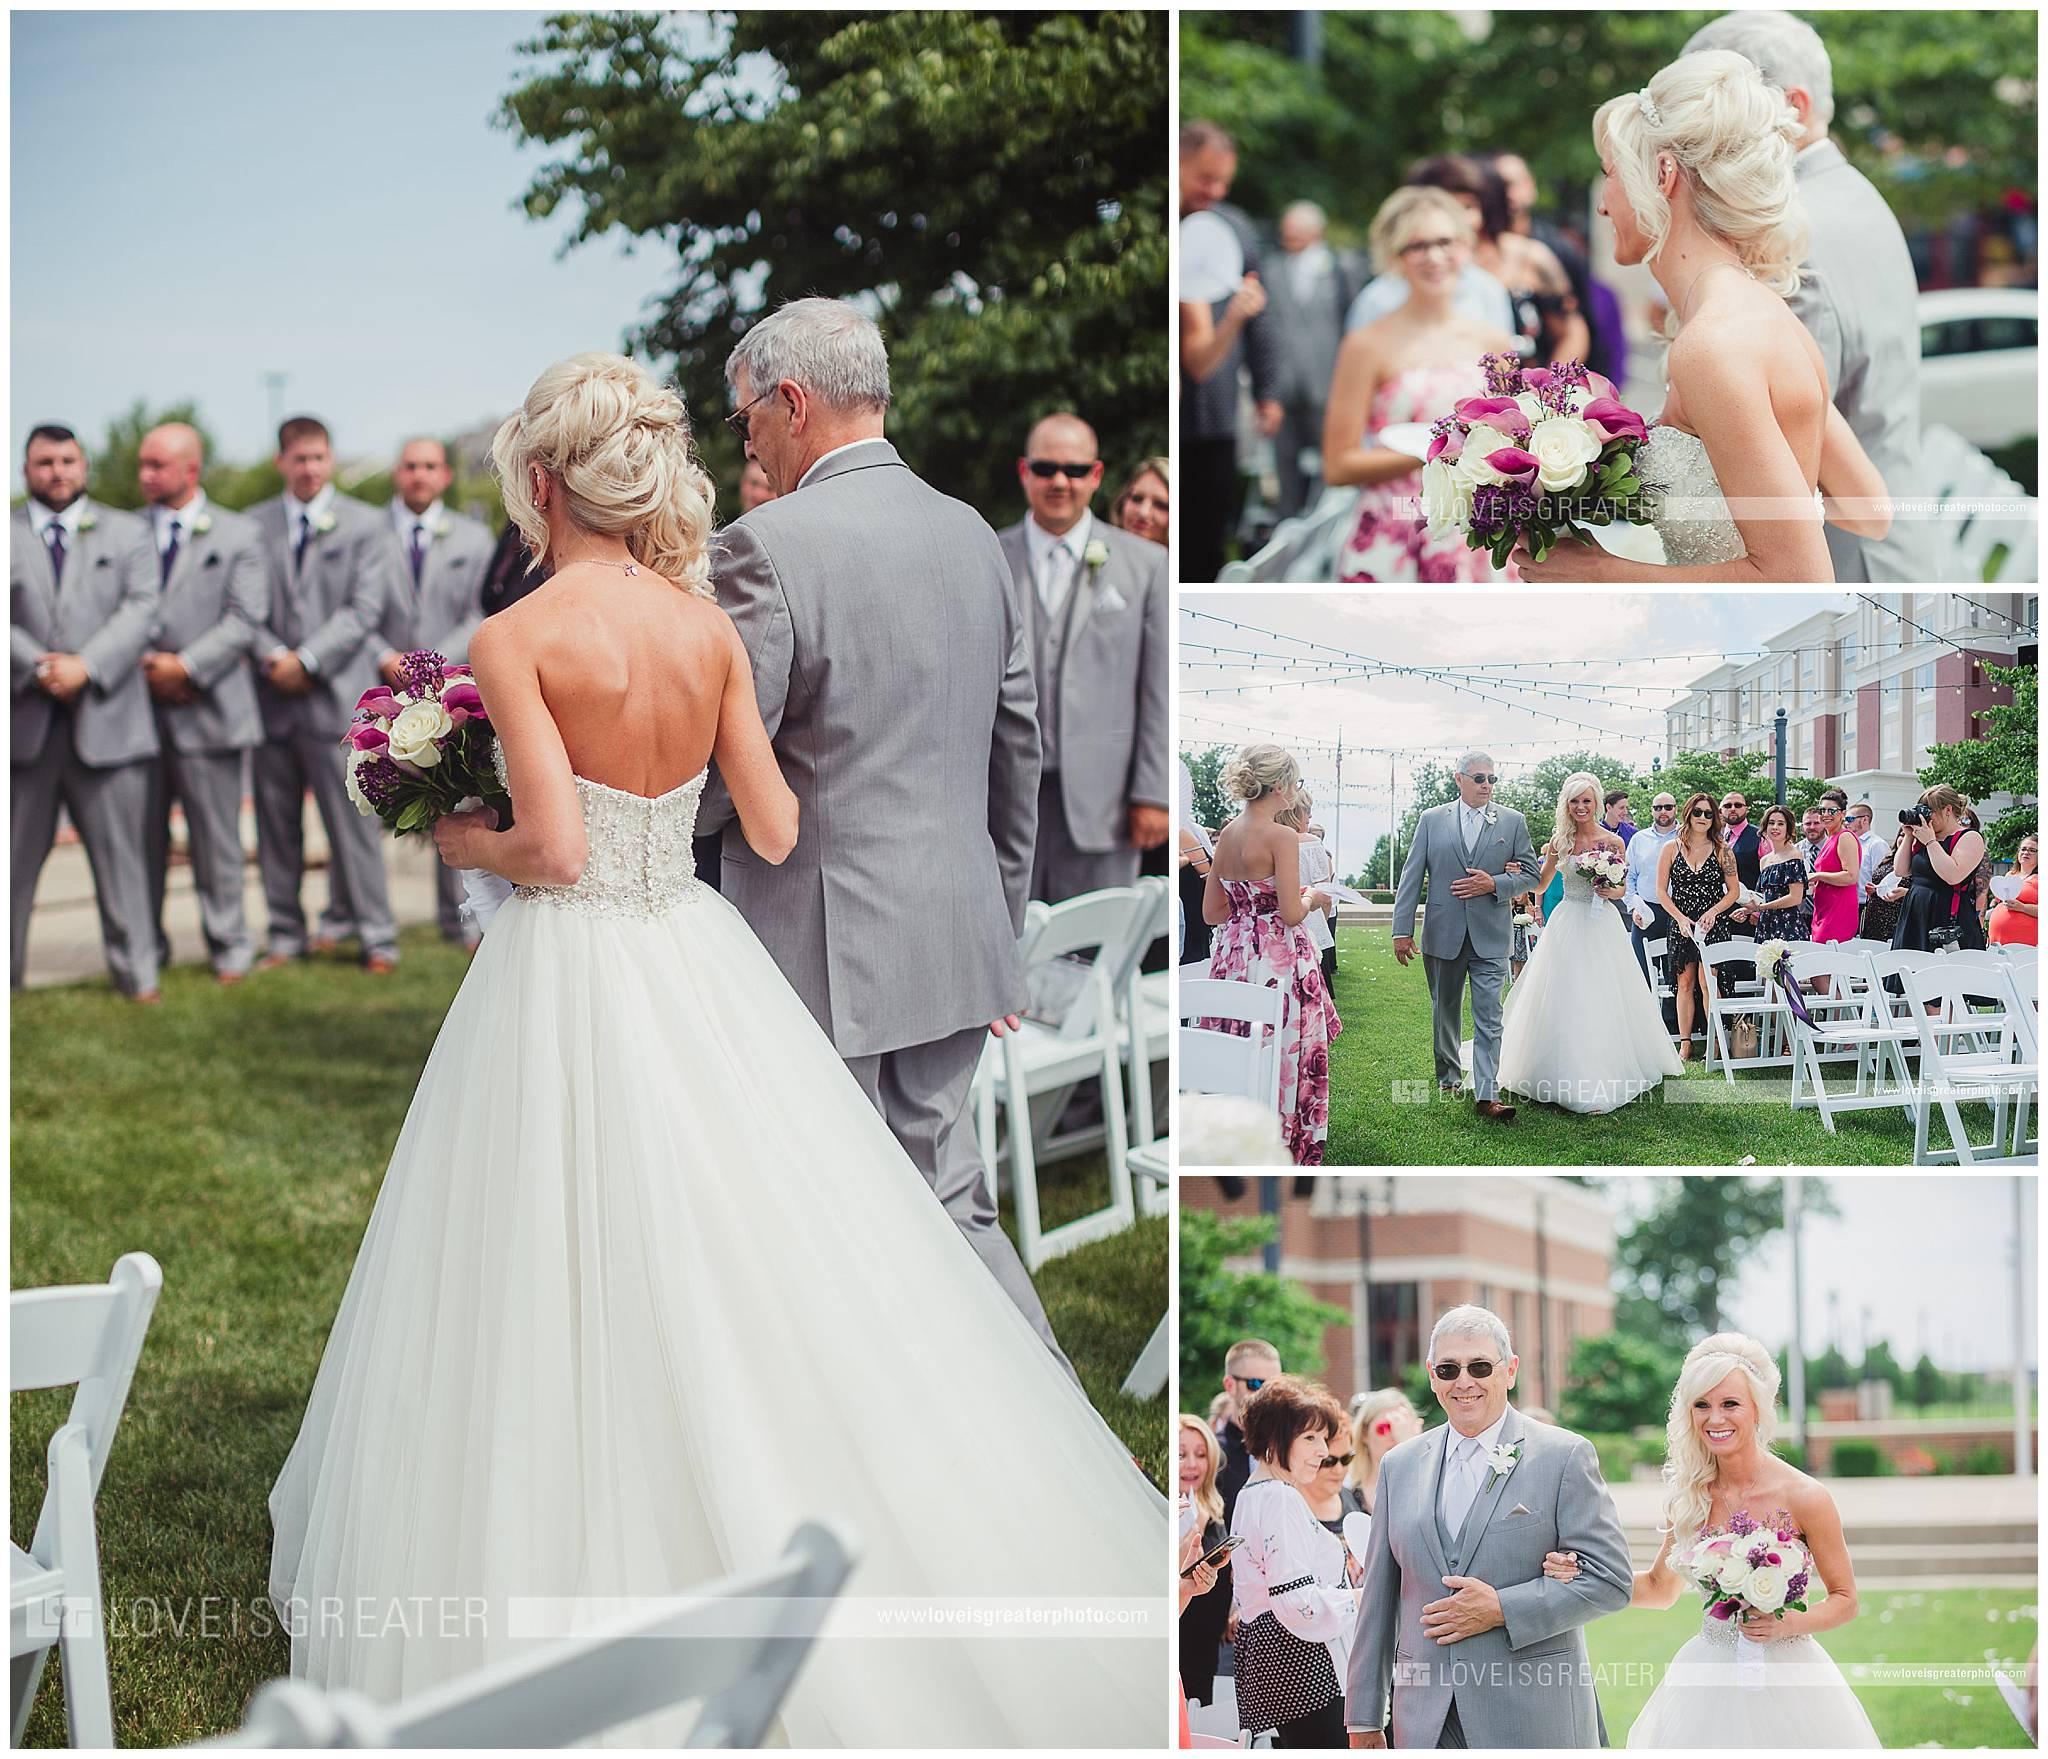 Hilton Garden Inn Wedding Archives Love Is Greater Photography